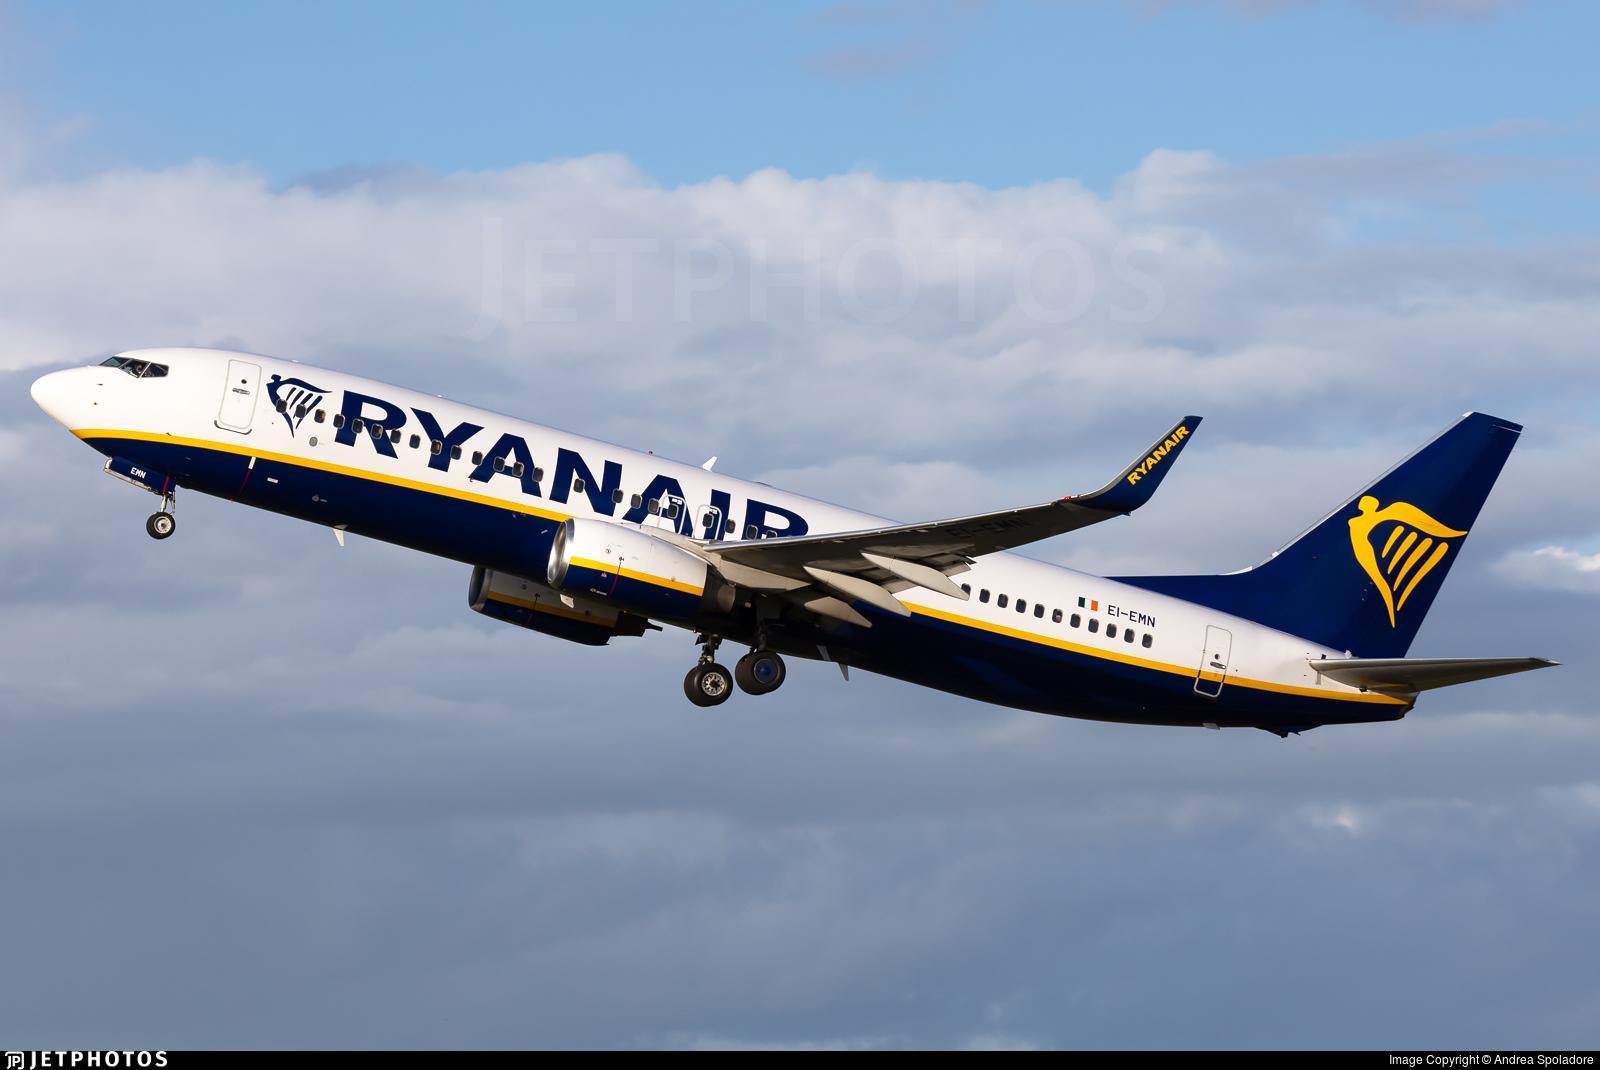 EI-EMN - Boeing 737-8AS - Ryanair